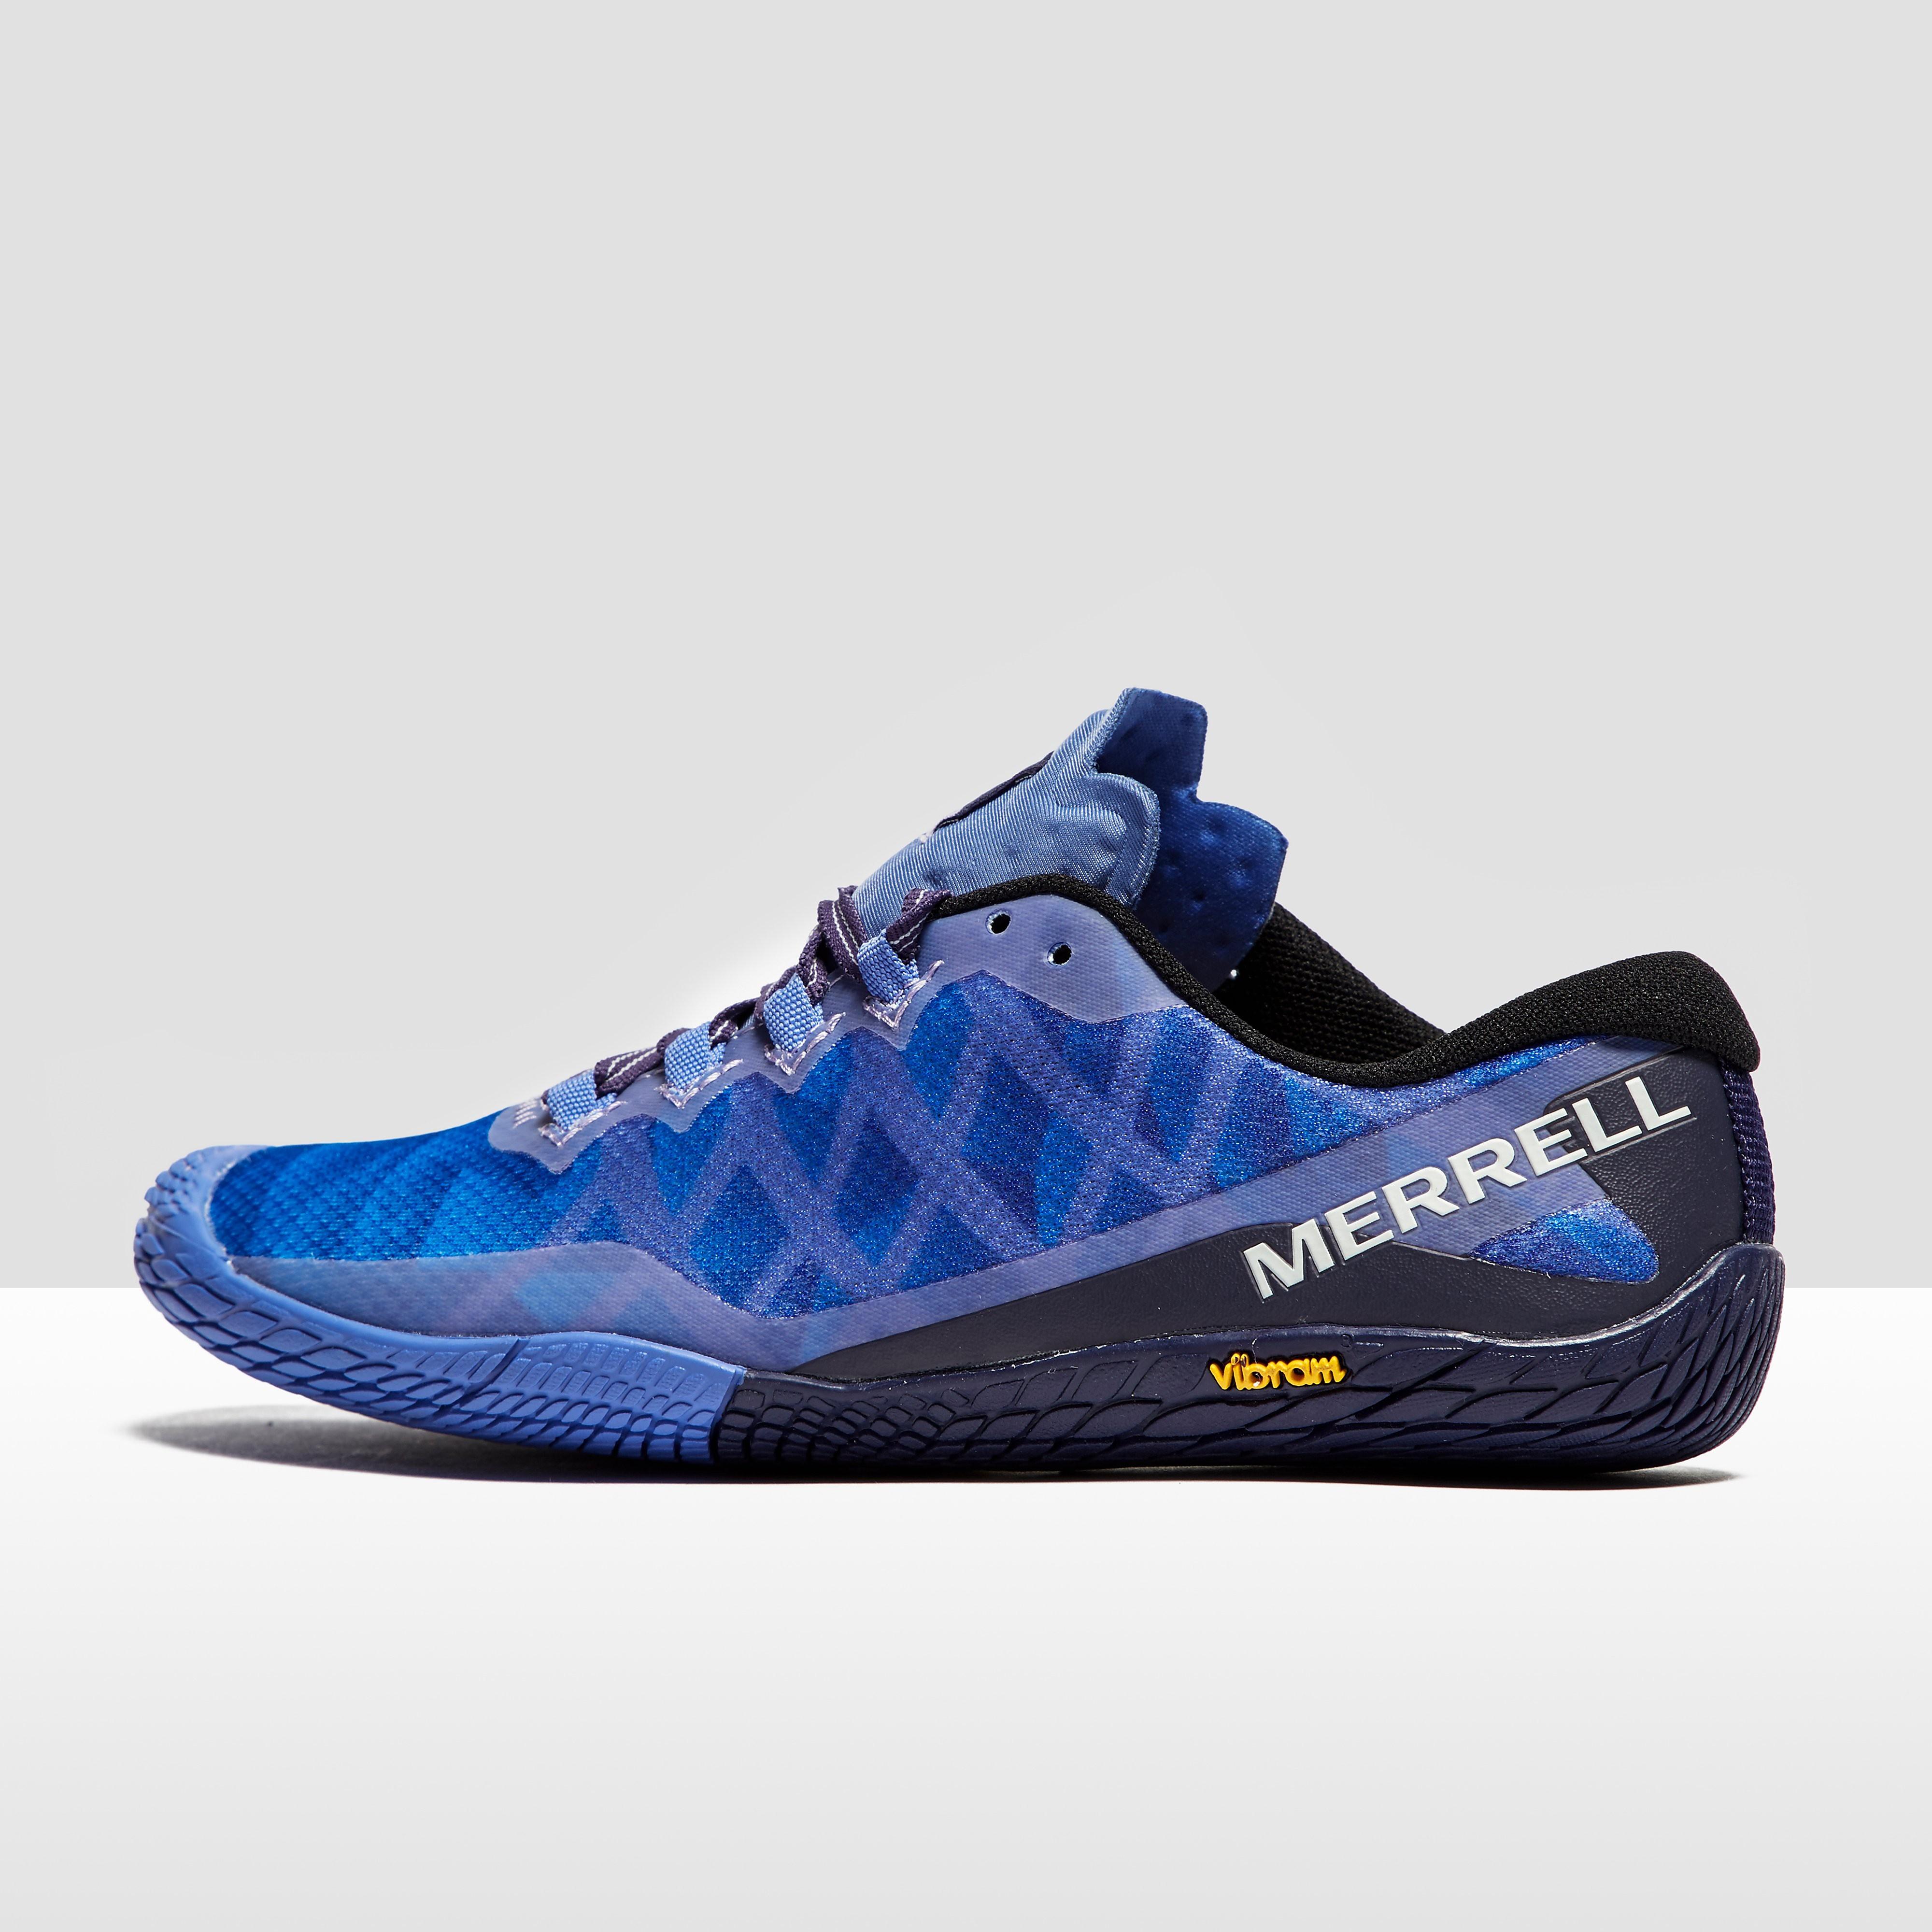 Merrell Vapor Glove 3 Men's Running Shoes